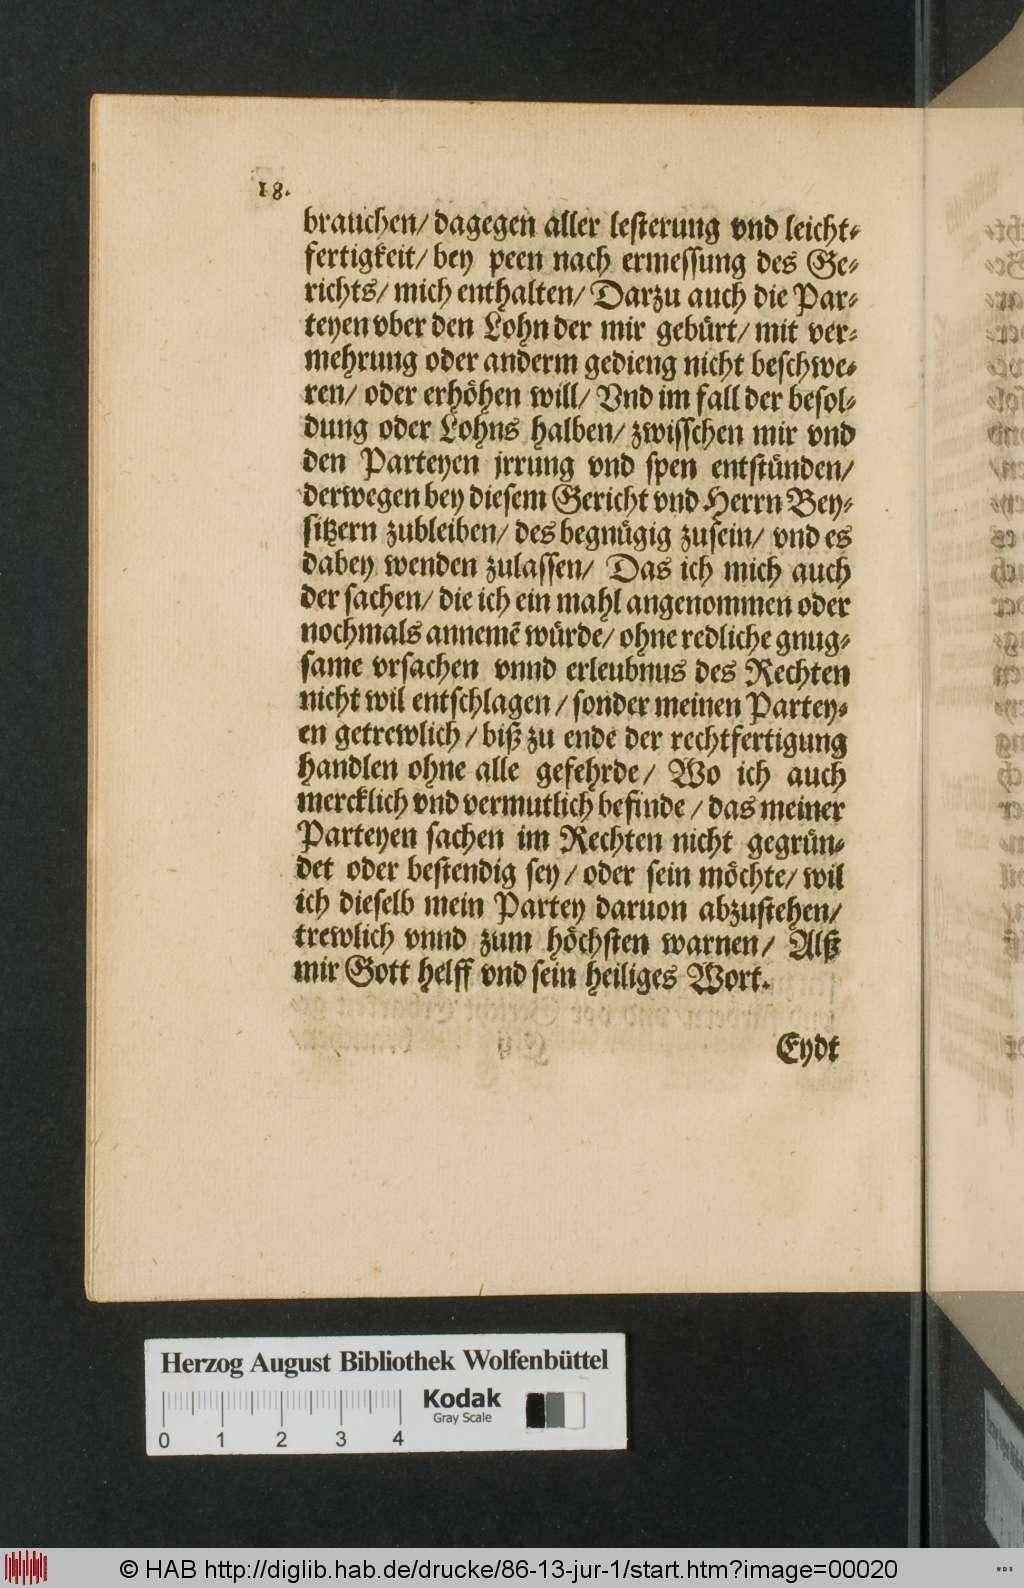 http://diglib.hab.de/drucke/86-13-jur-1/00020.jpg